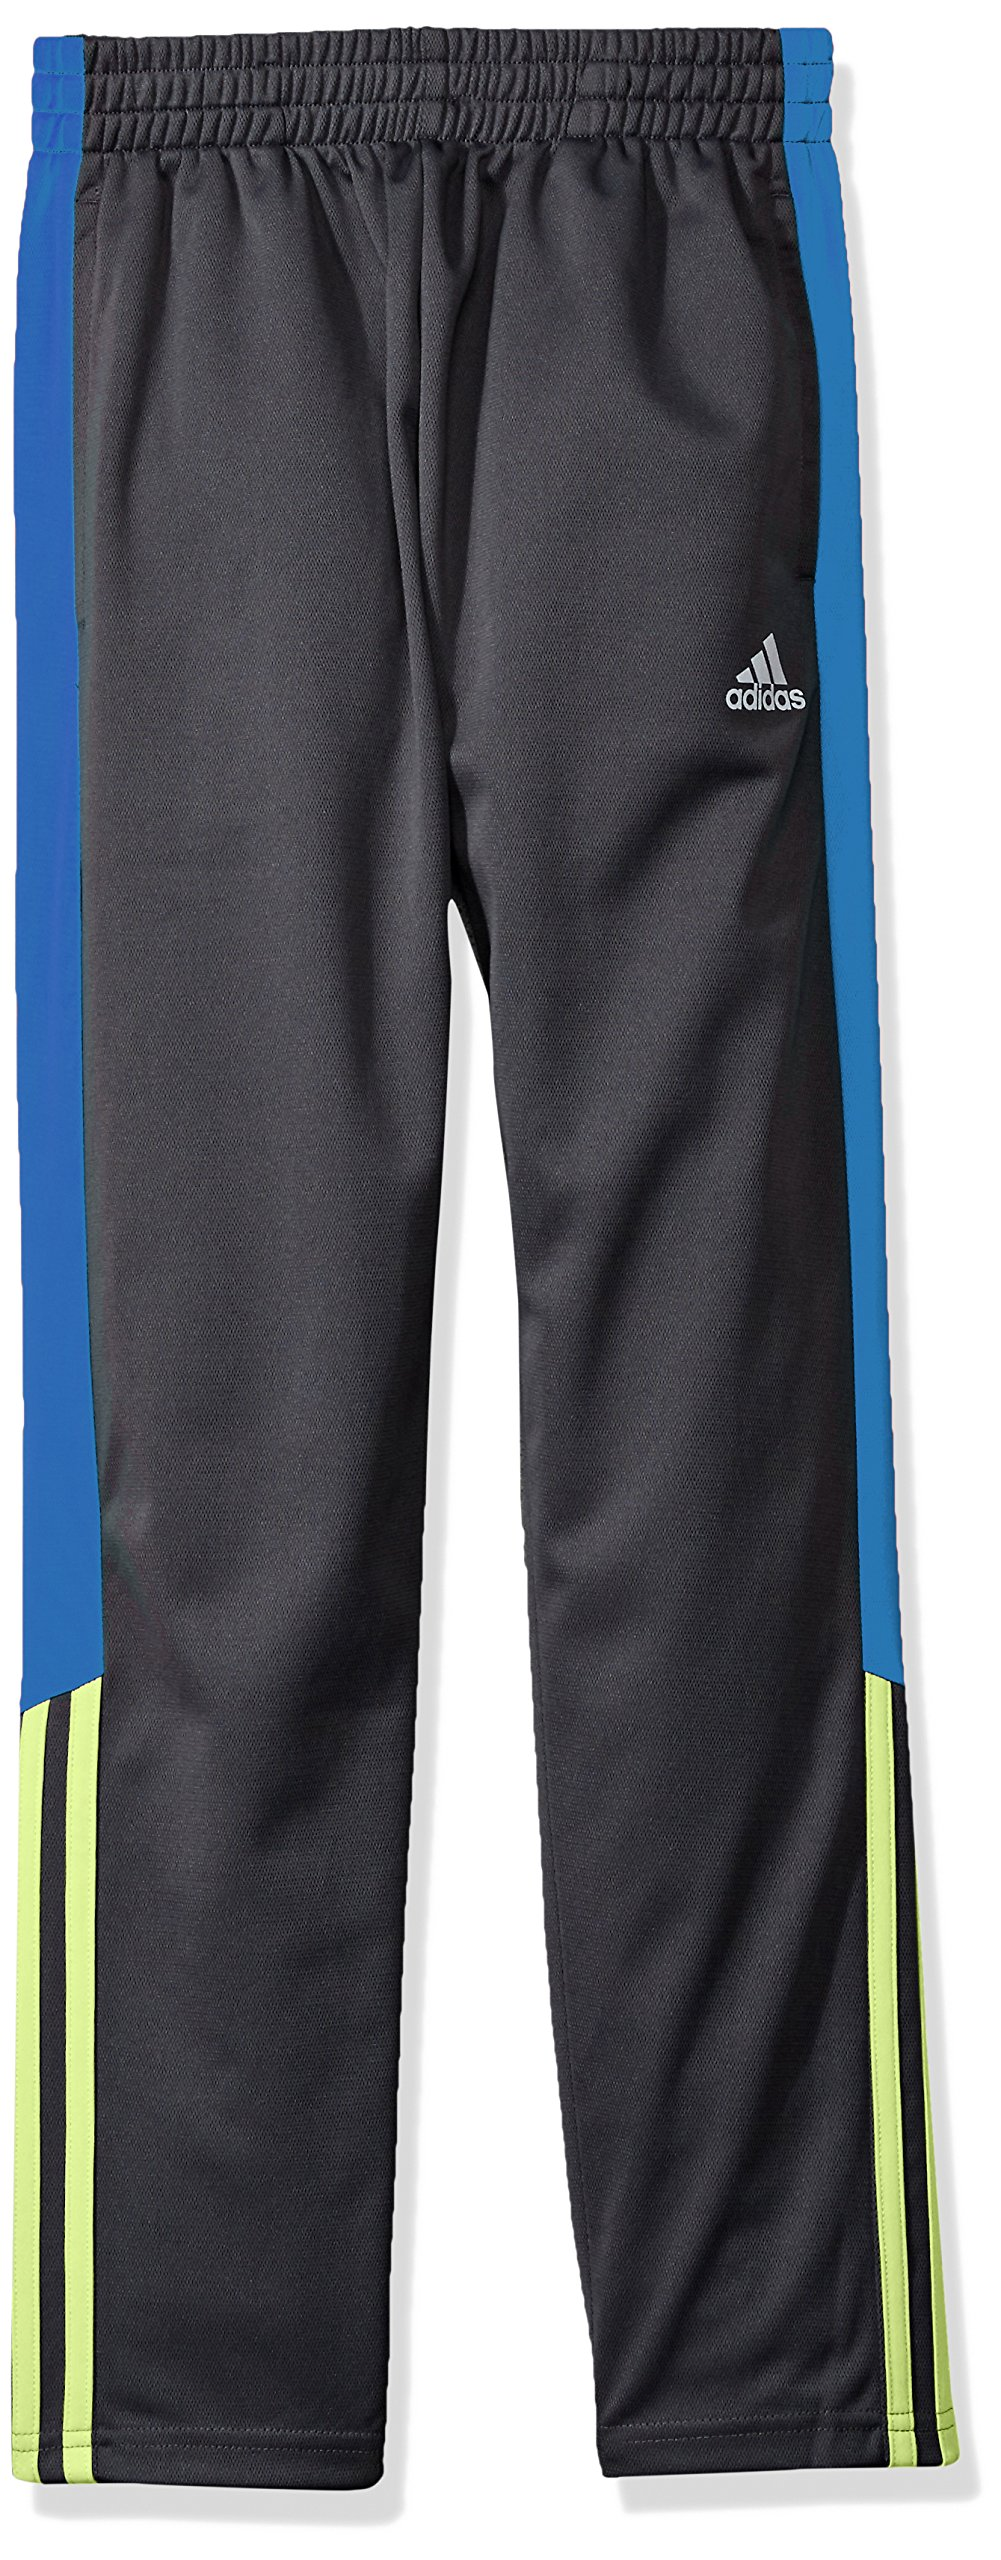 adidas Toddler Boys' Tricot Pant, Grey Heather Body Solar Yellow, 2T